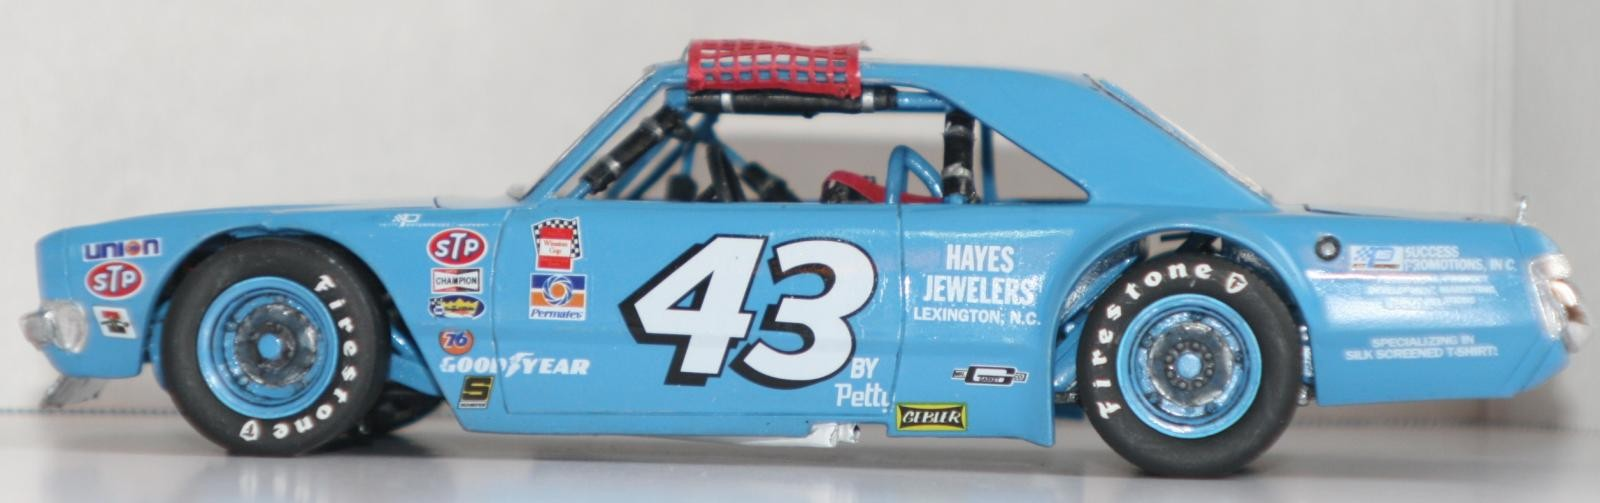 Dodge Dart Nascar >> 1 25 Richard Petty Short Track Dodge Dart Nascar Kit Car Imodeler